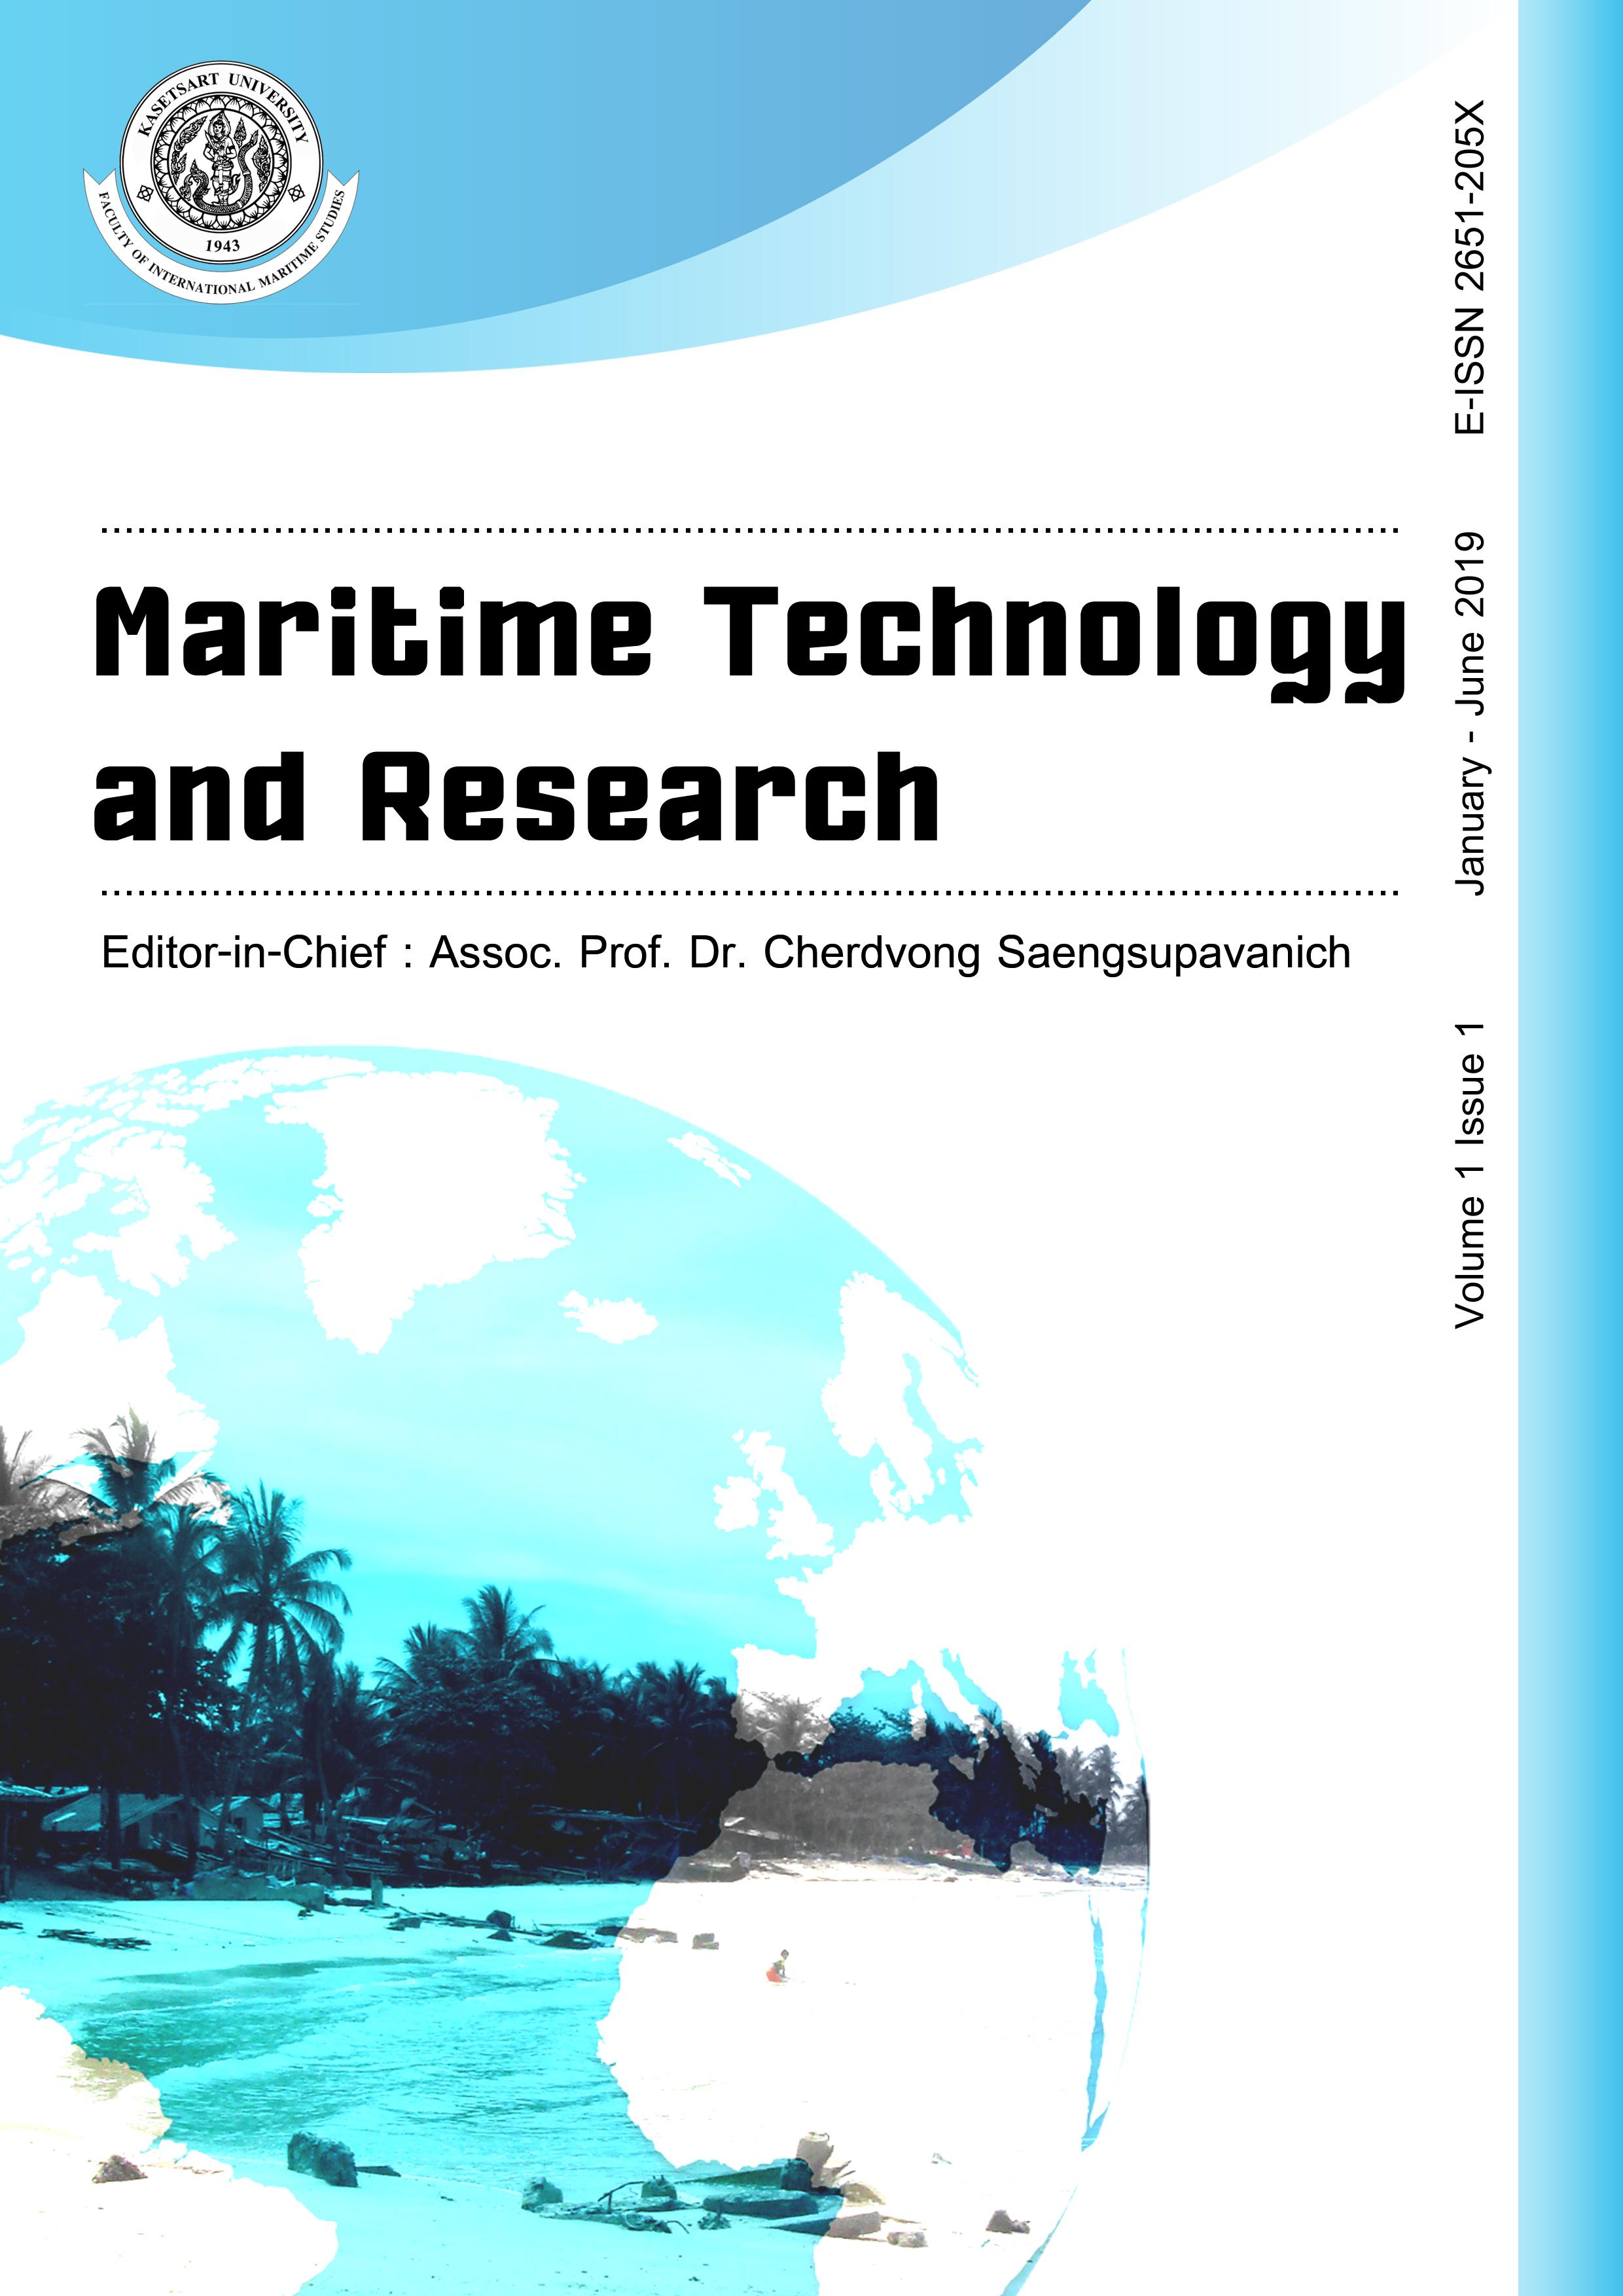 12th Anniversary Faculty of International Maritime Studies, Kasetsart University